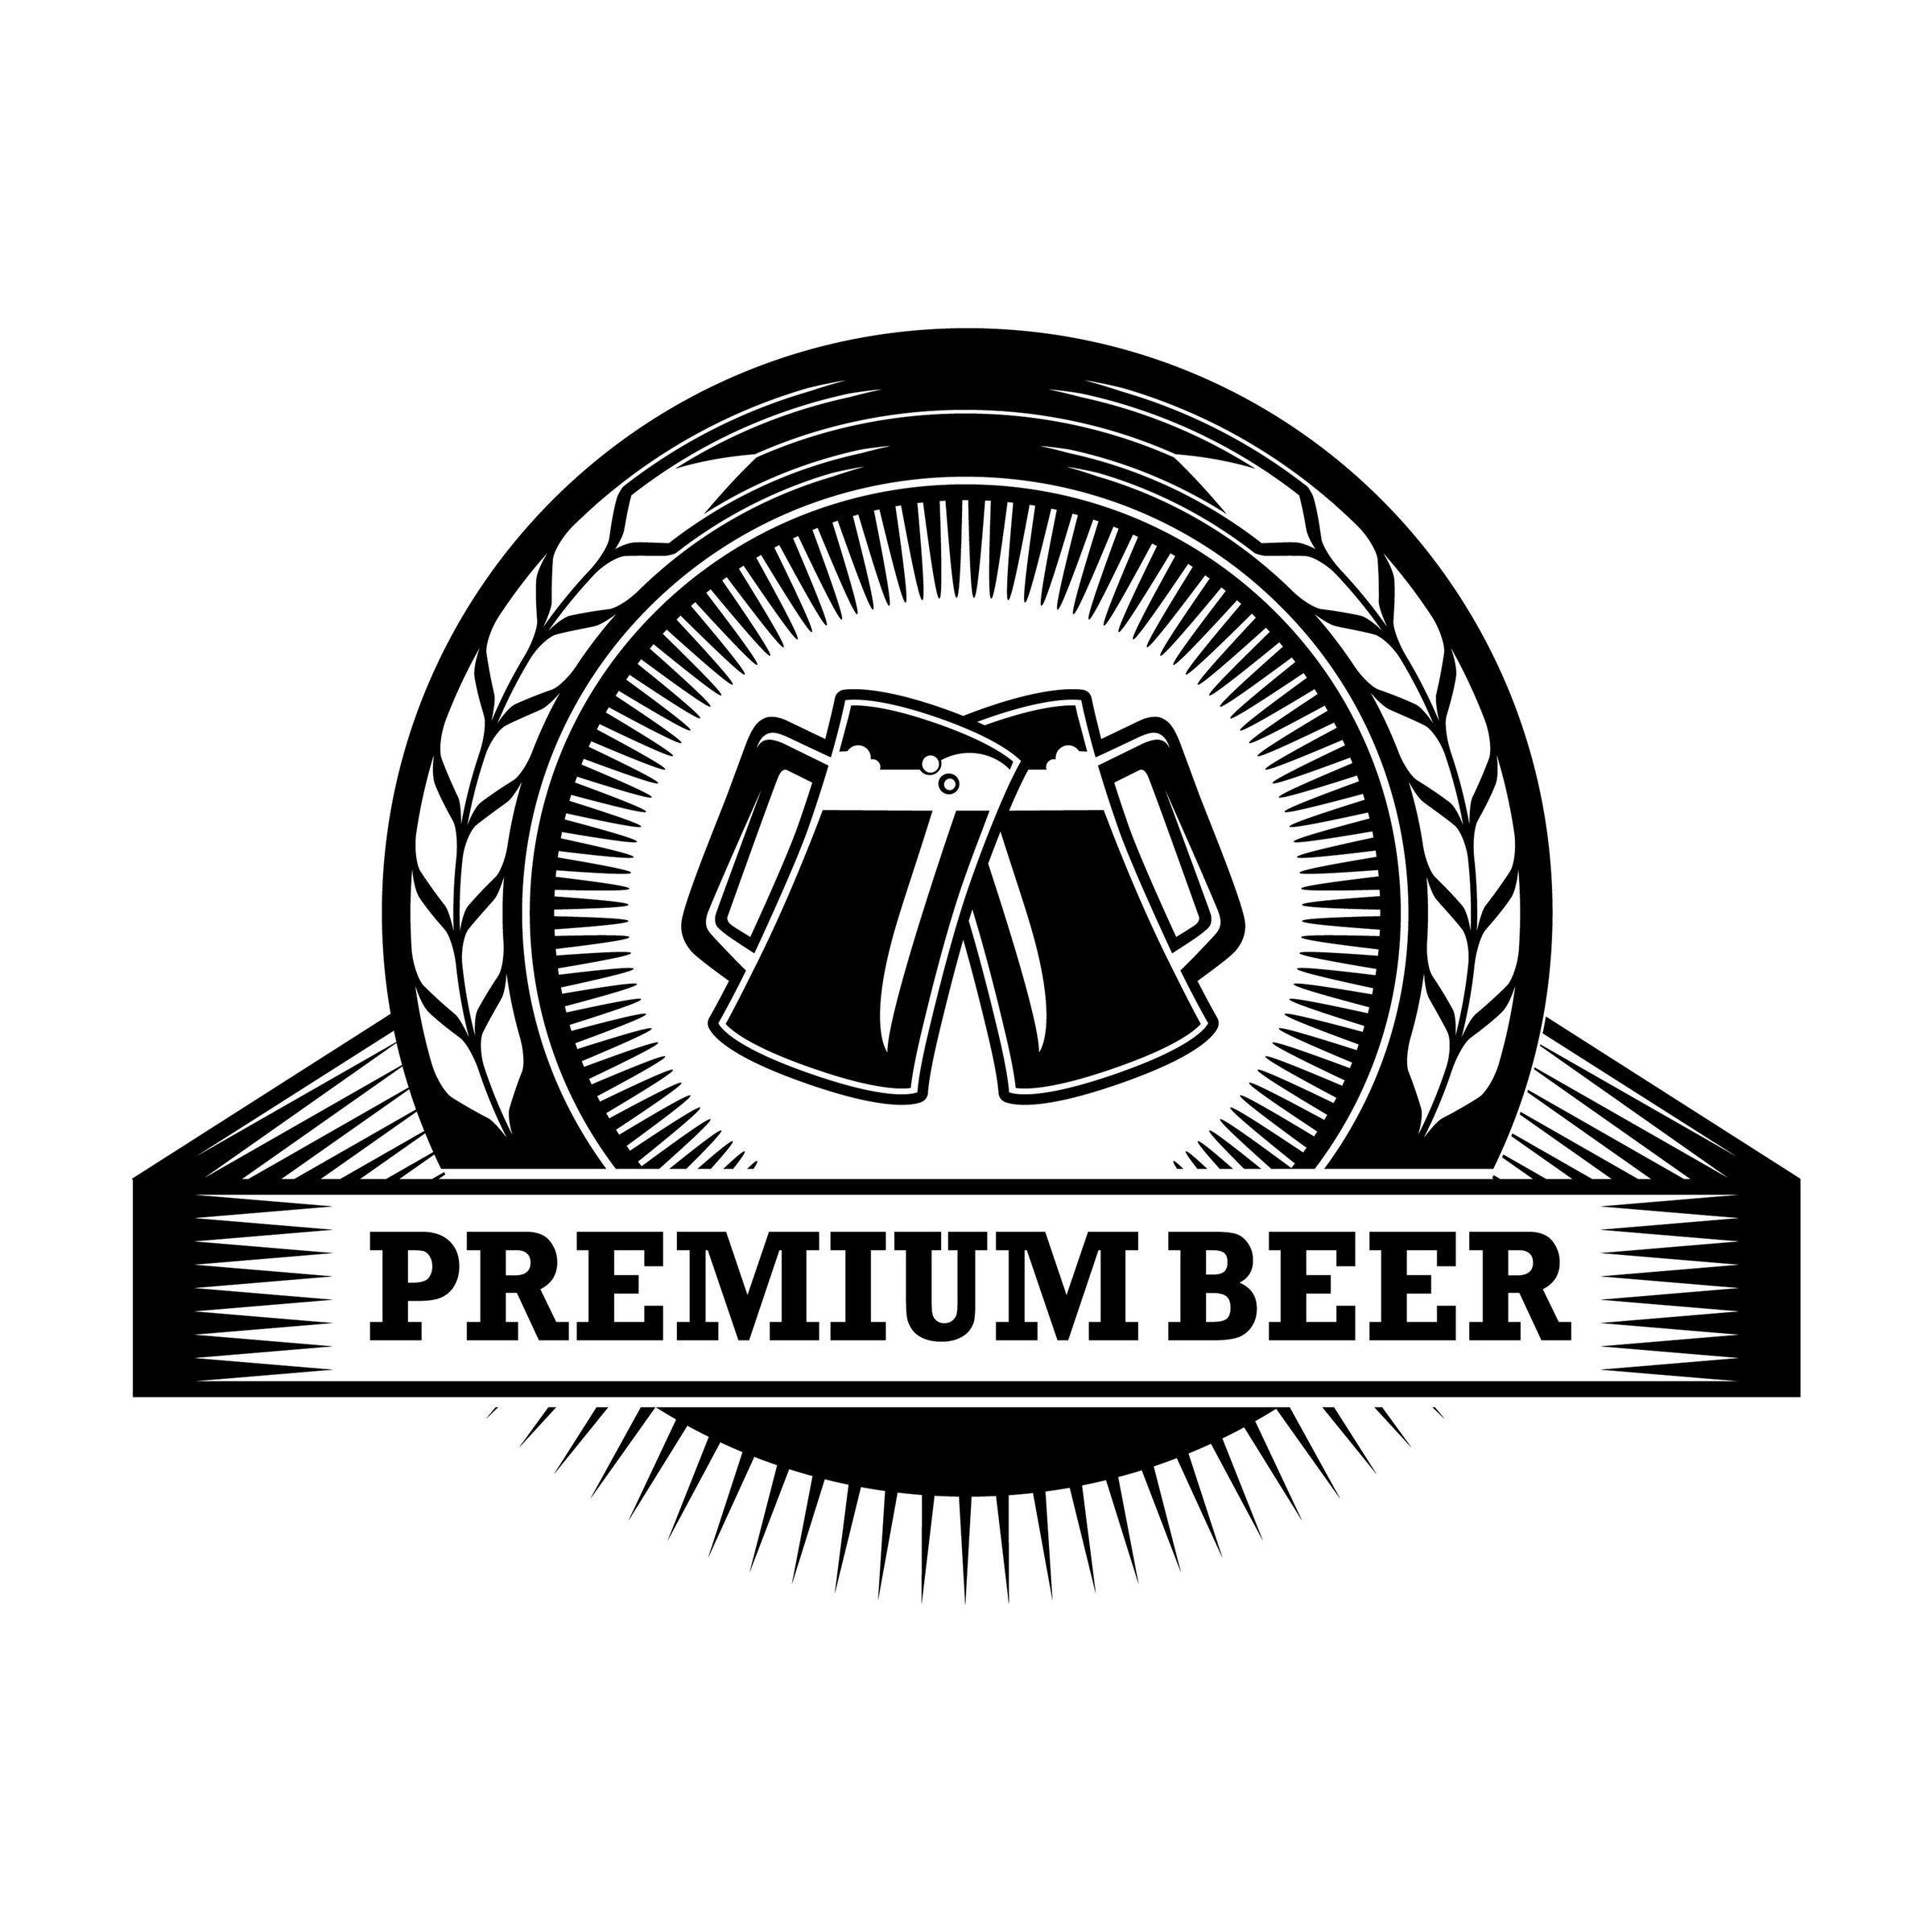 Beer Logo 29 Barrel Pub Bar Tavern Brew Brewery Barley Etsy In 2021 Beer Logo Beer Drinks Logo